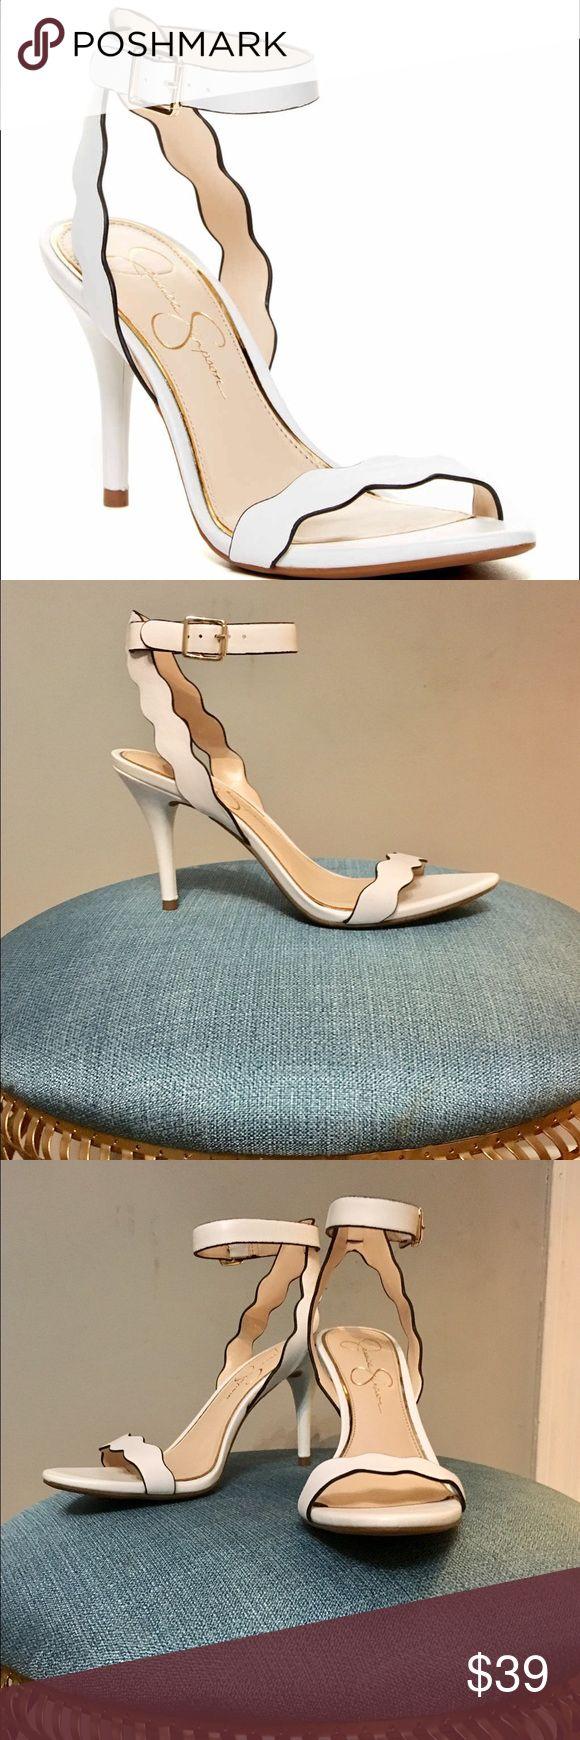 NEW Jessica Simpson white sandals NEW; NEVER WORN Jessica Simpson Shoes Sandals